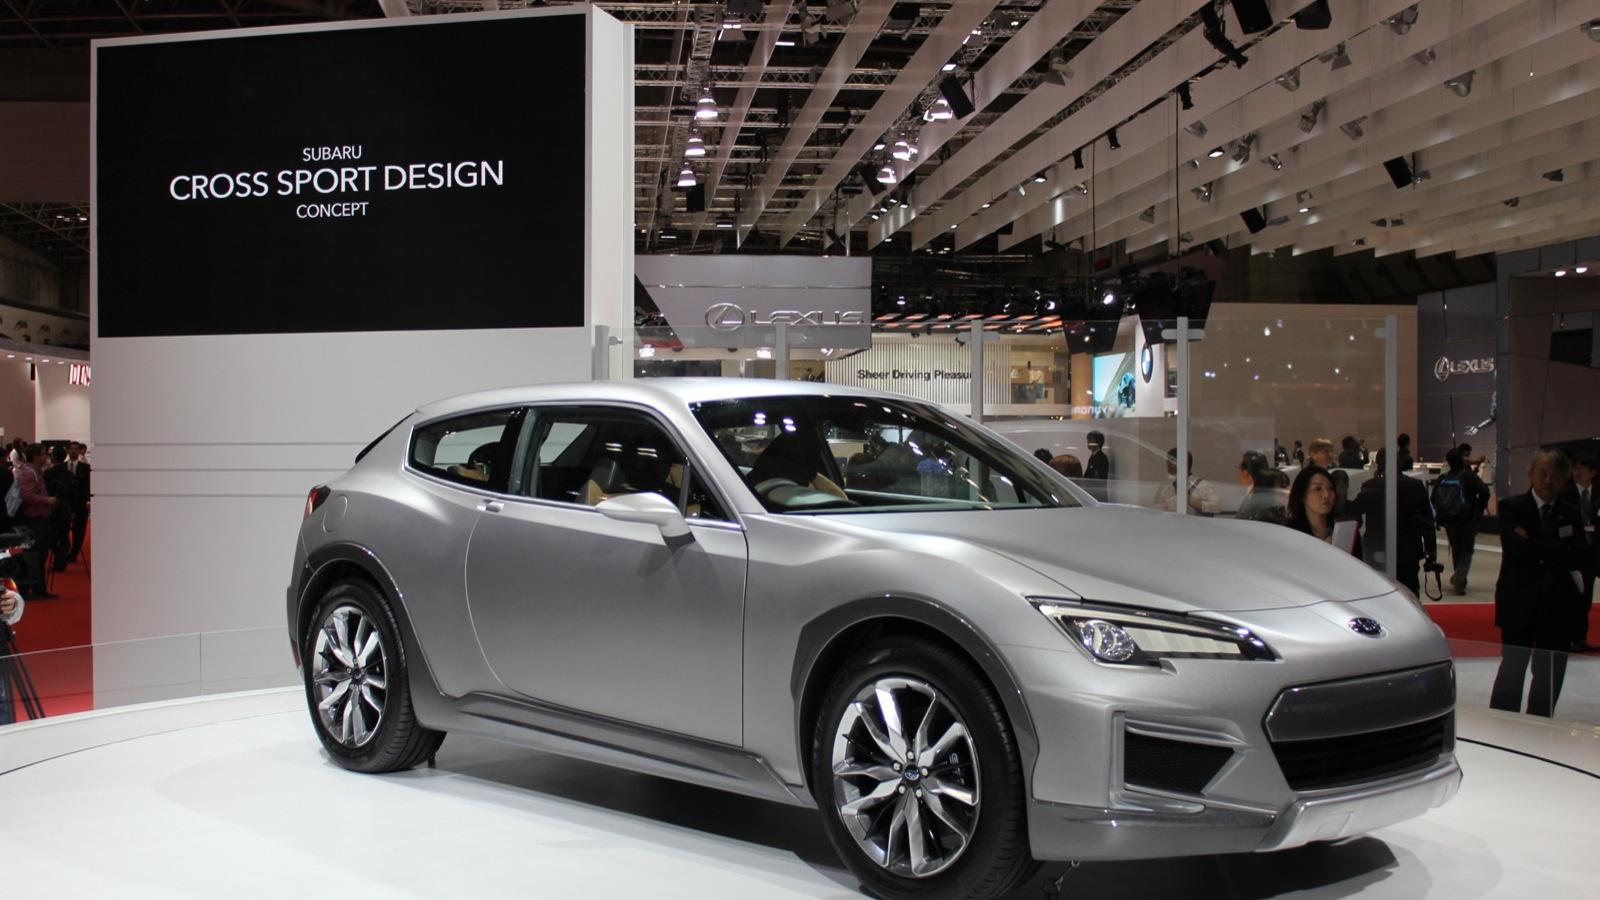 Subaru Cross Sport Design Concept  -  2013 Tokyo Motor Show